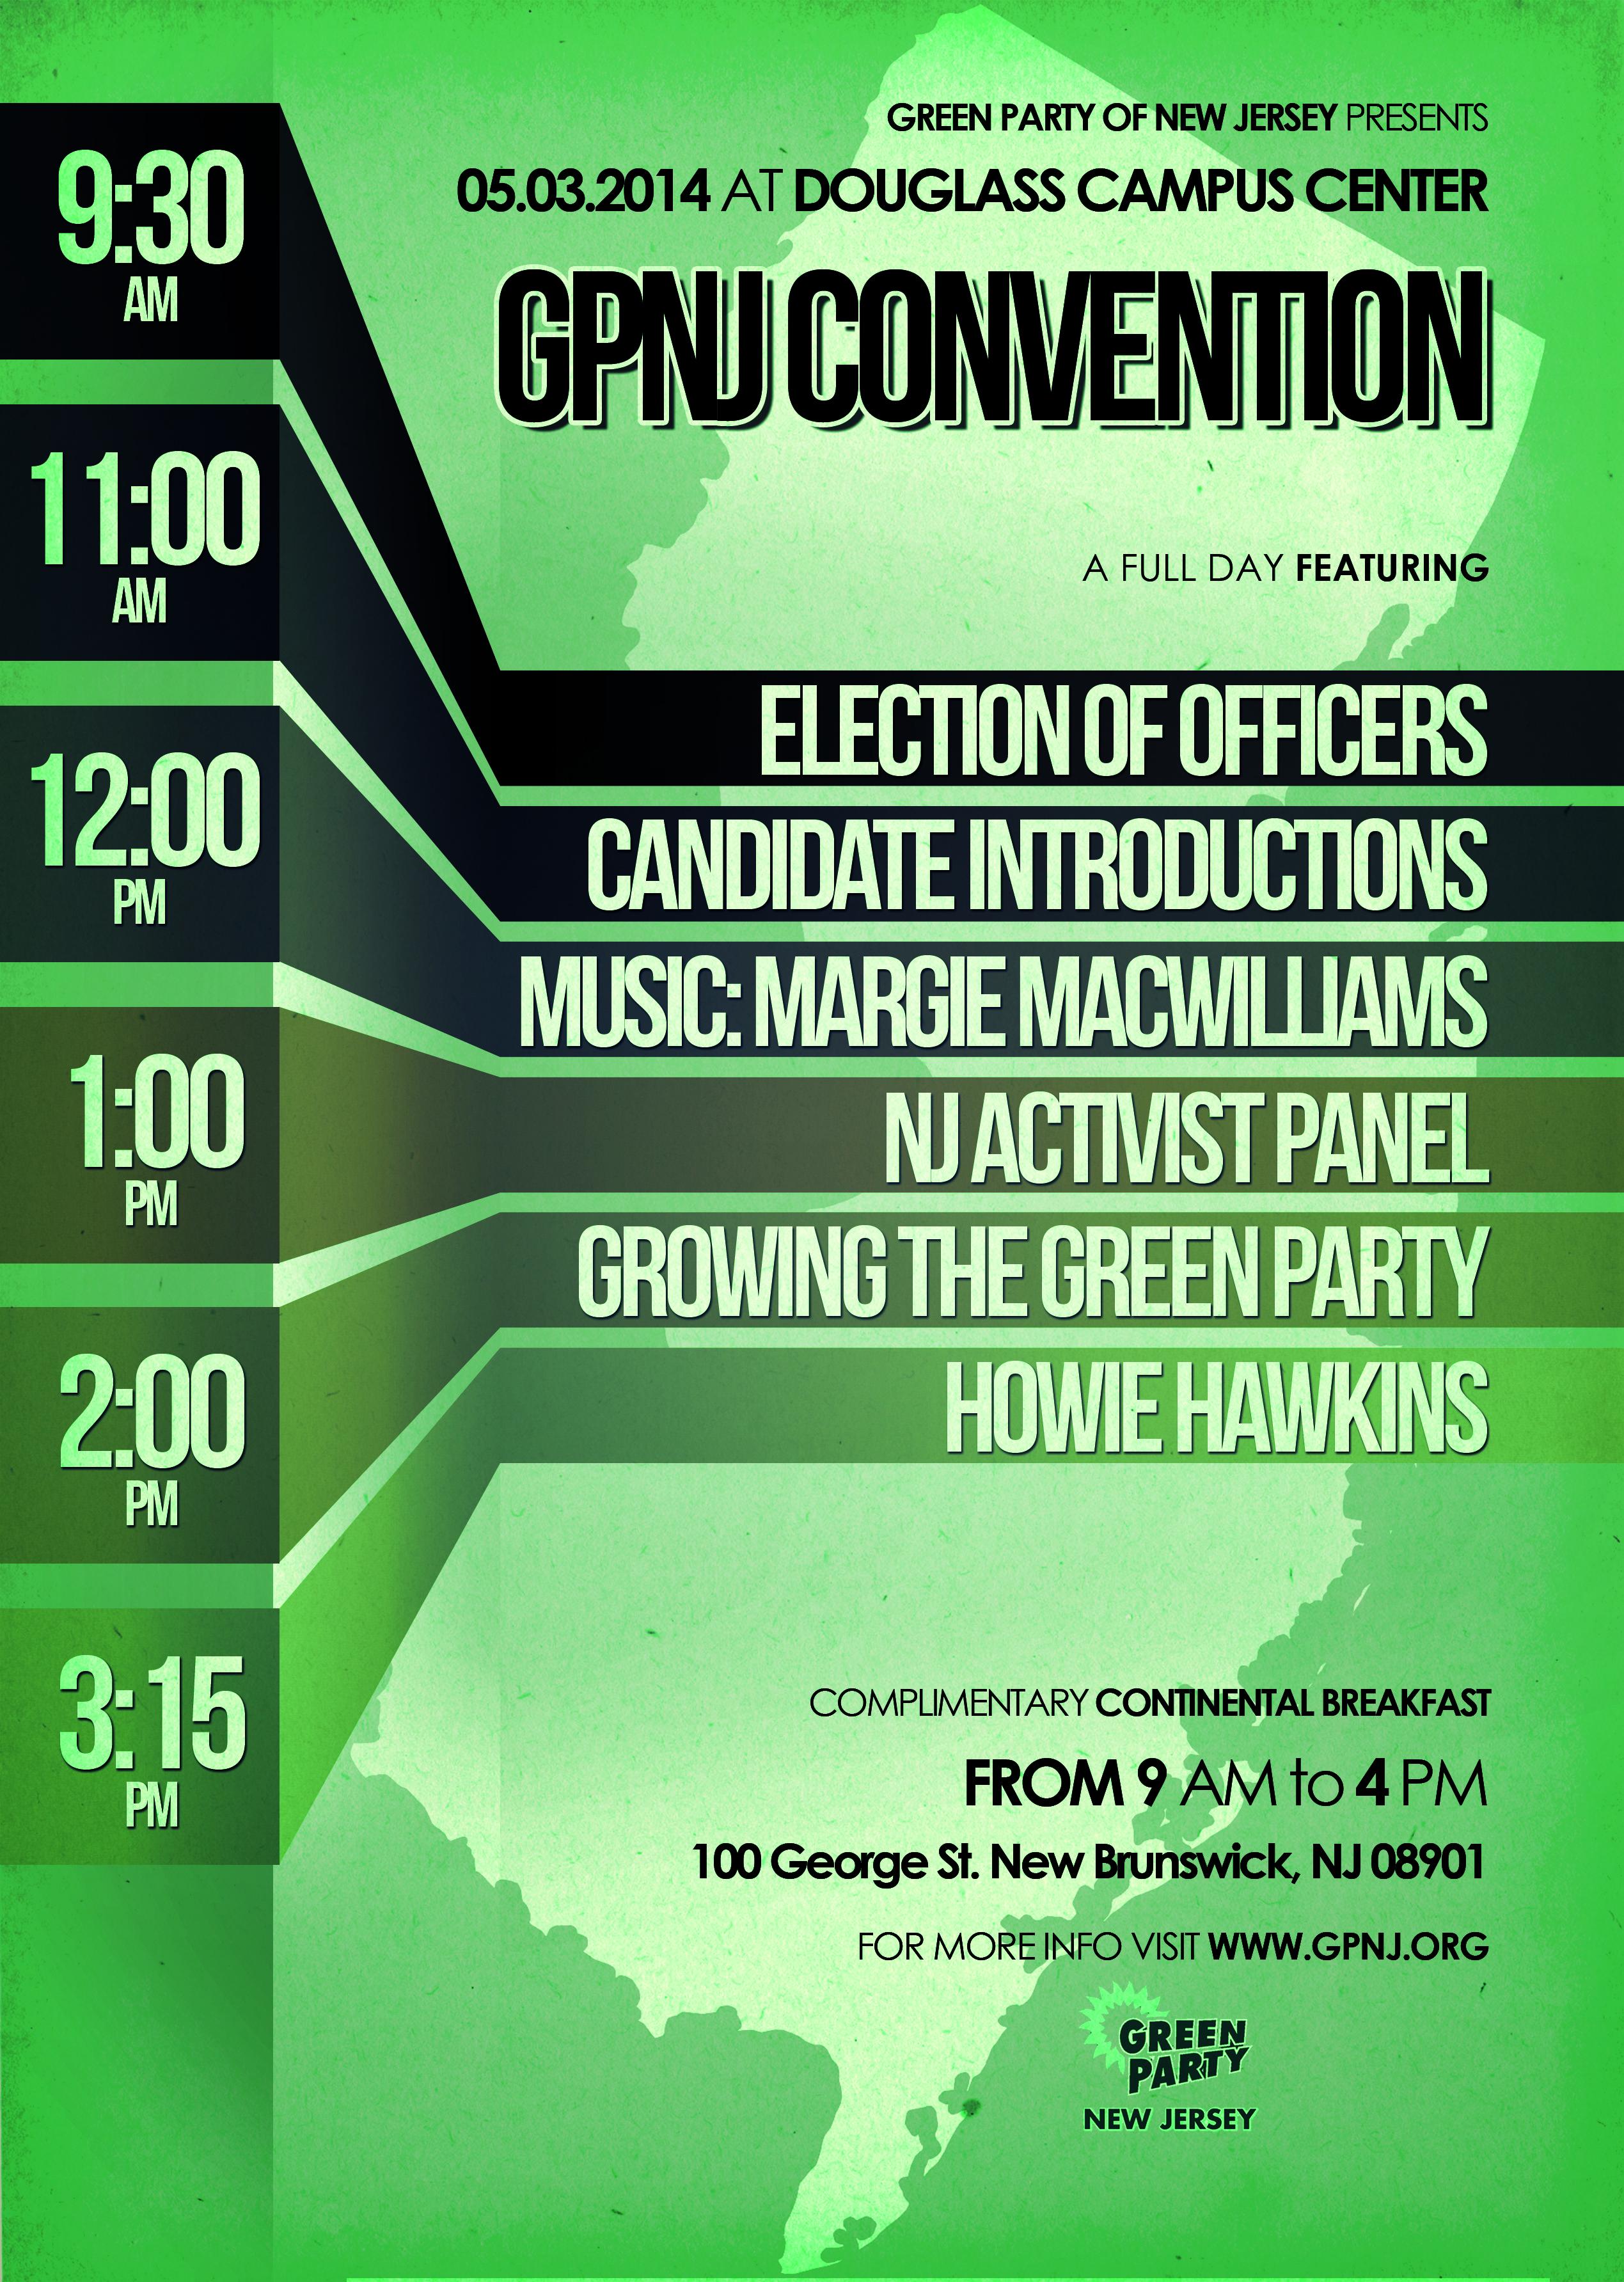 GPNJ_Convention_Agenda.jpg